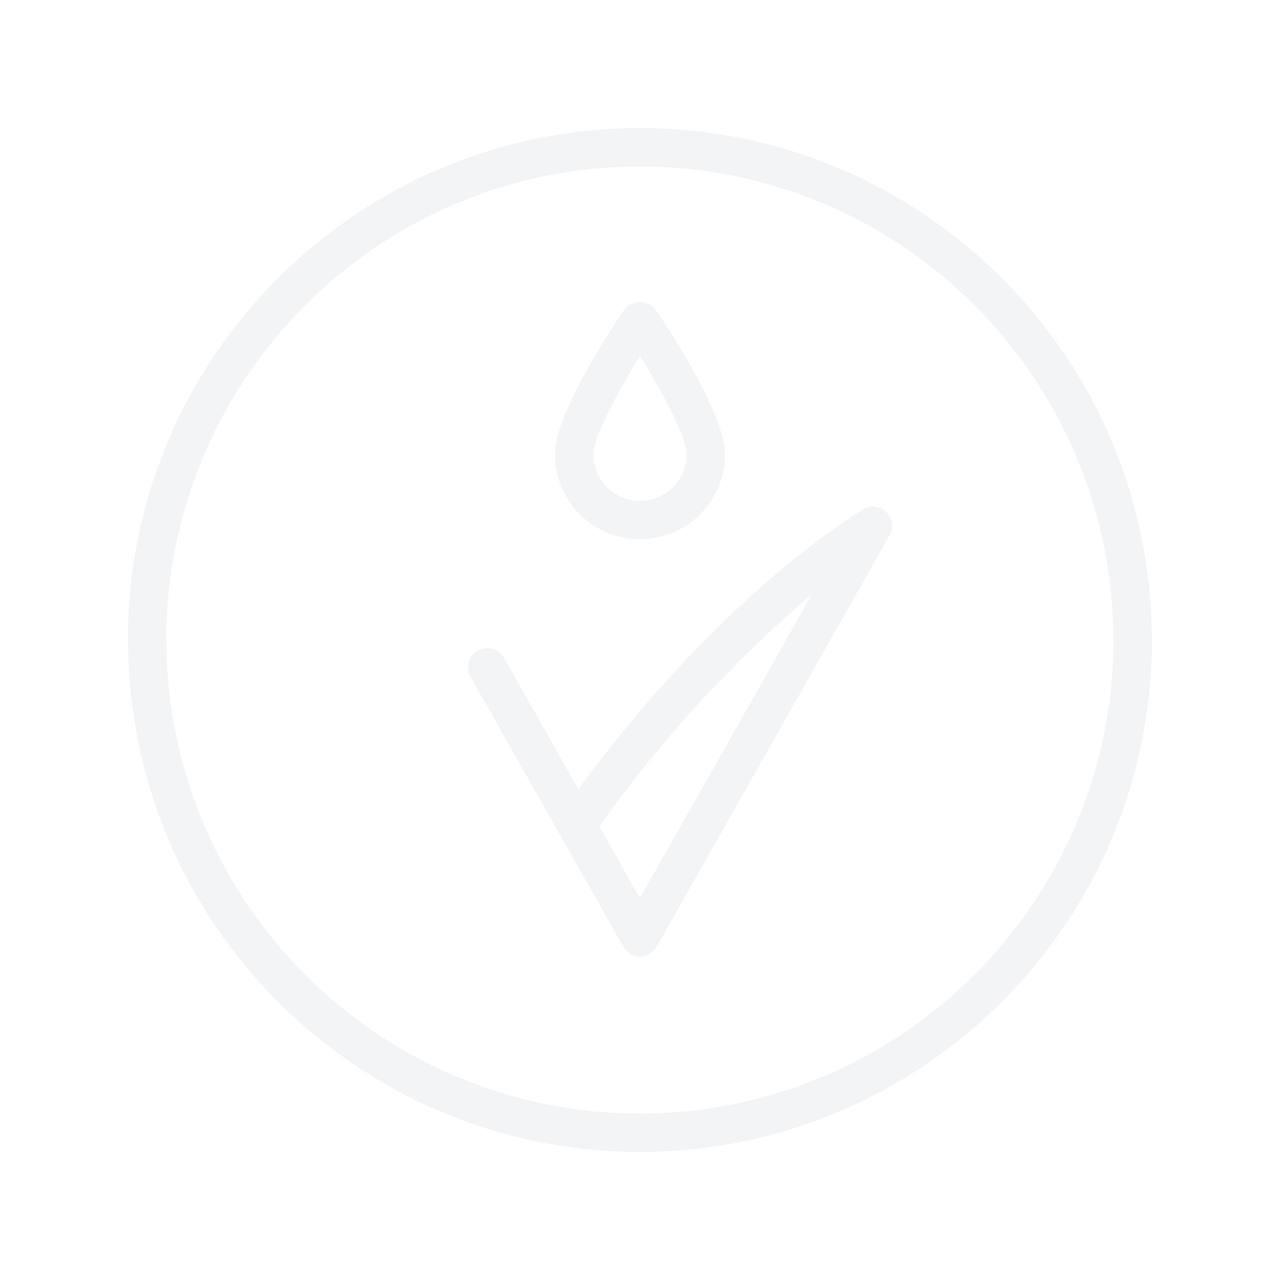 MAKEUP REVOLUTION Obsession Blush No.B101 Nude 2g